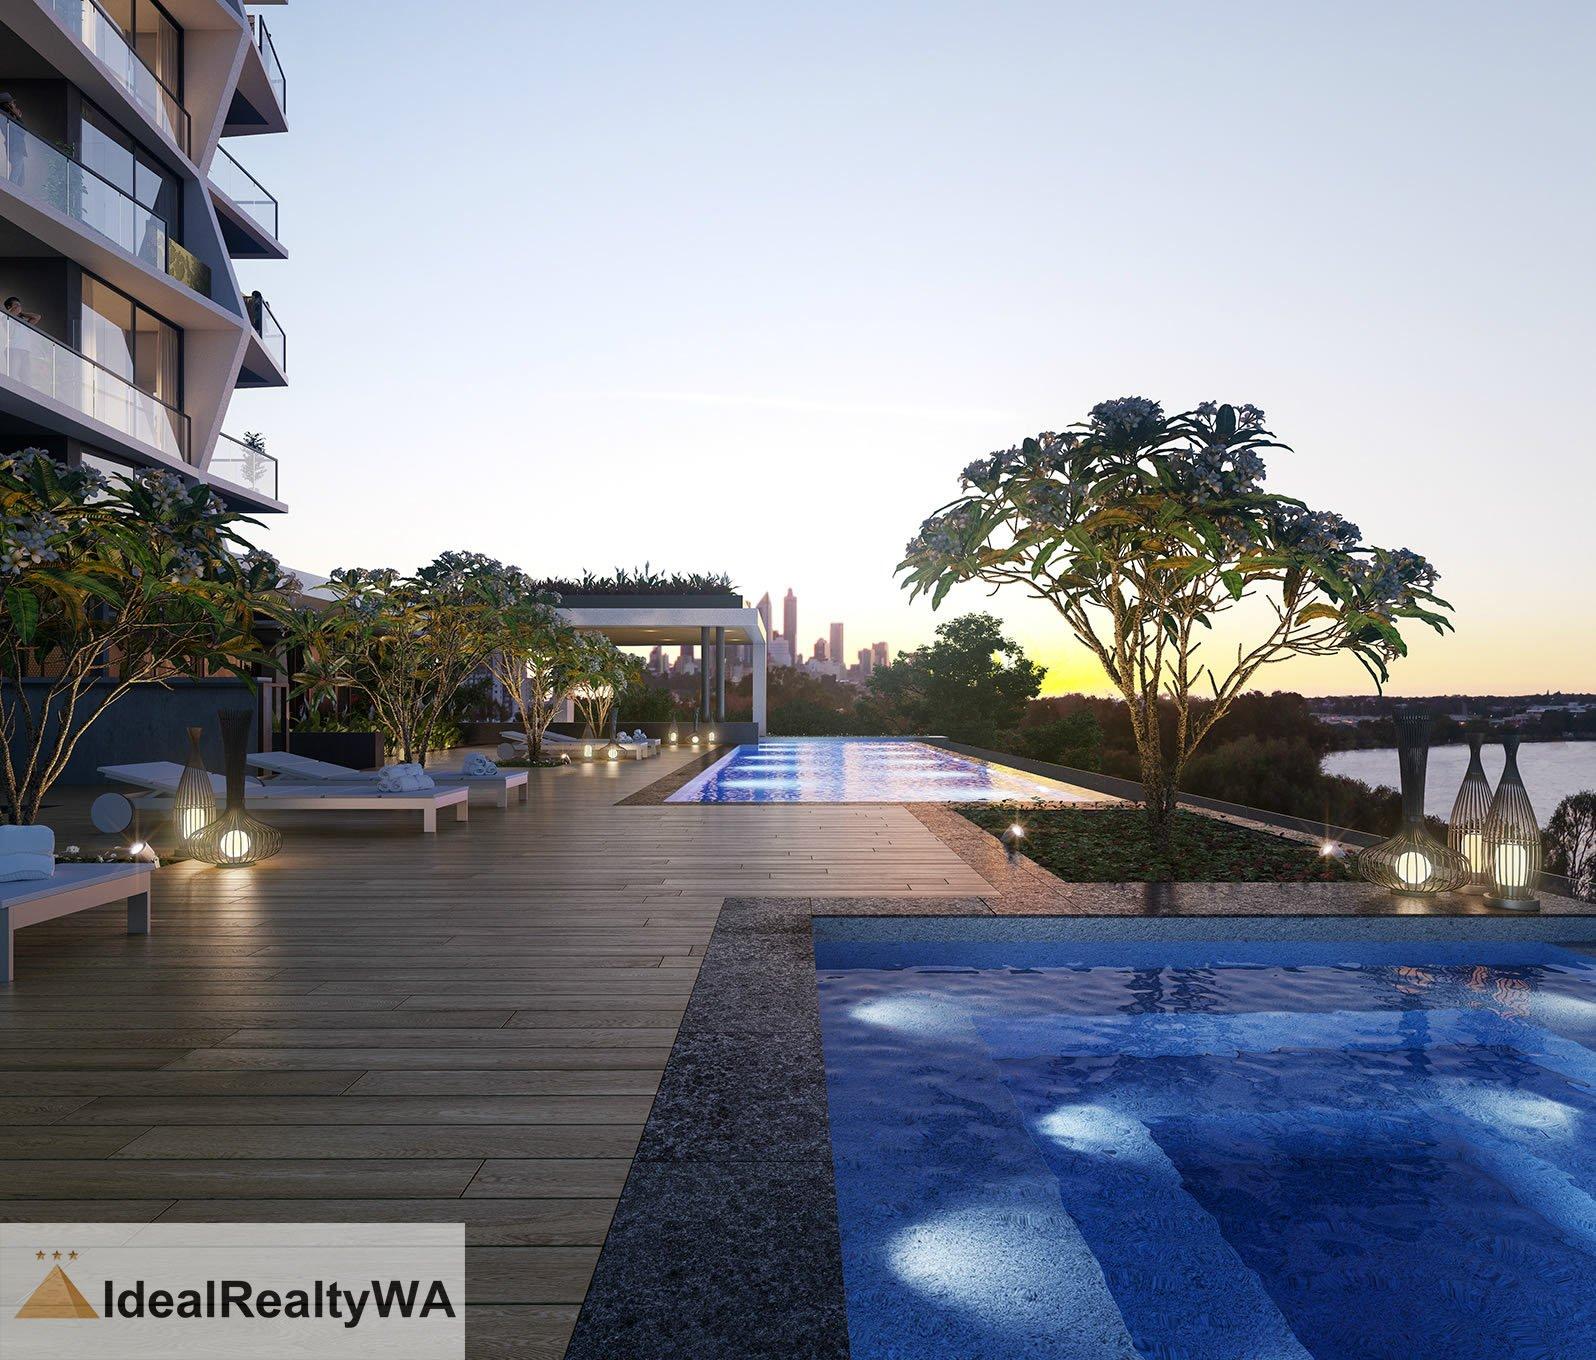 Riverfront Apartments: Riverfront Apartments